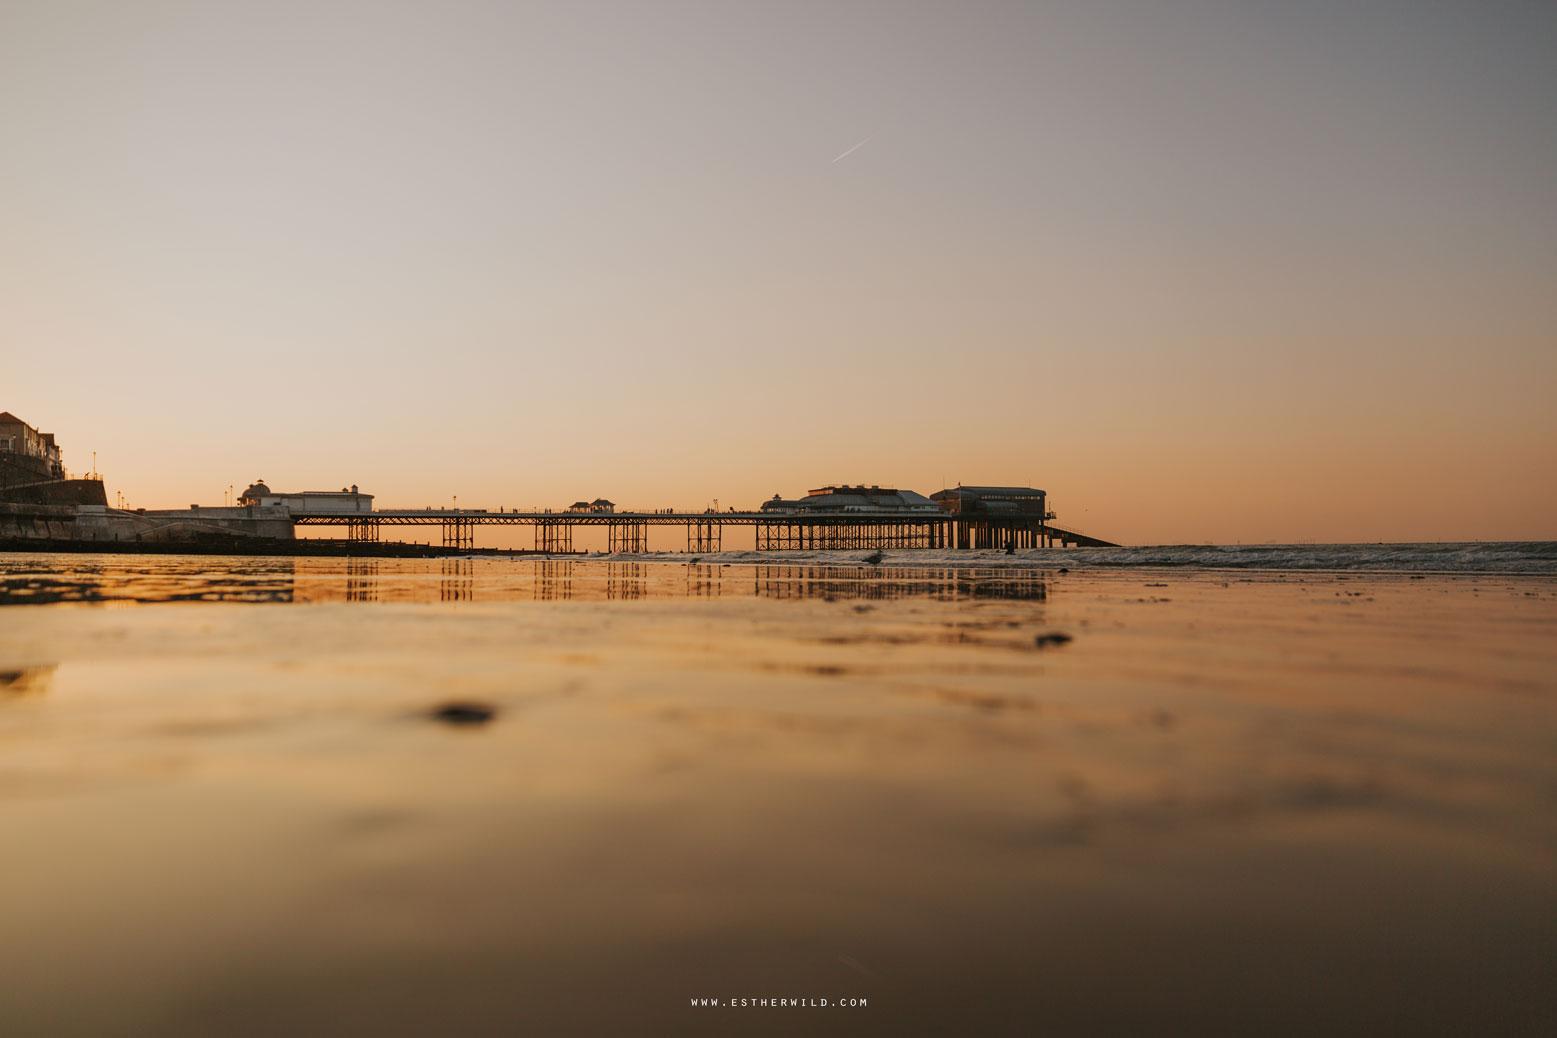 Cromer_Wedding_Beach_Outdoor_Ceremony_Norfolk_North_Lodge_Registry_Office_Rocket_House_Cafe_Cromer_Pier_IMG_4983_IMGL8504.jpg